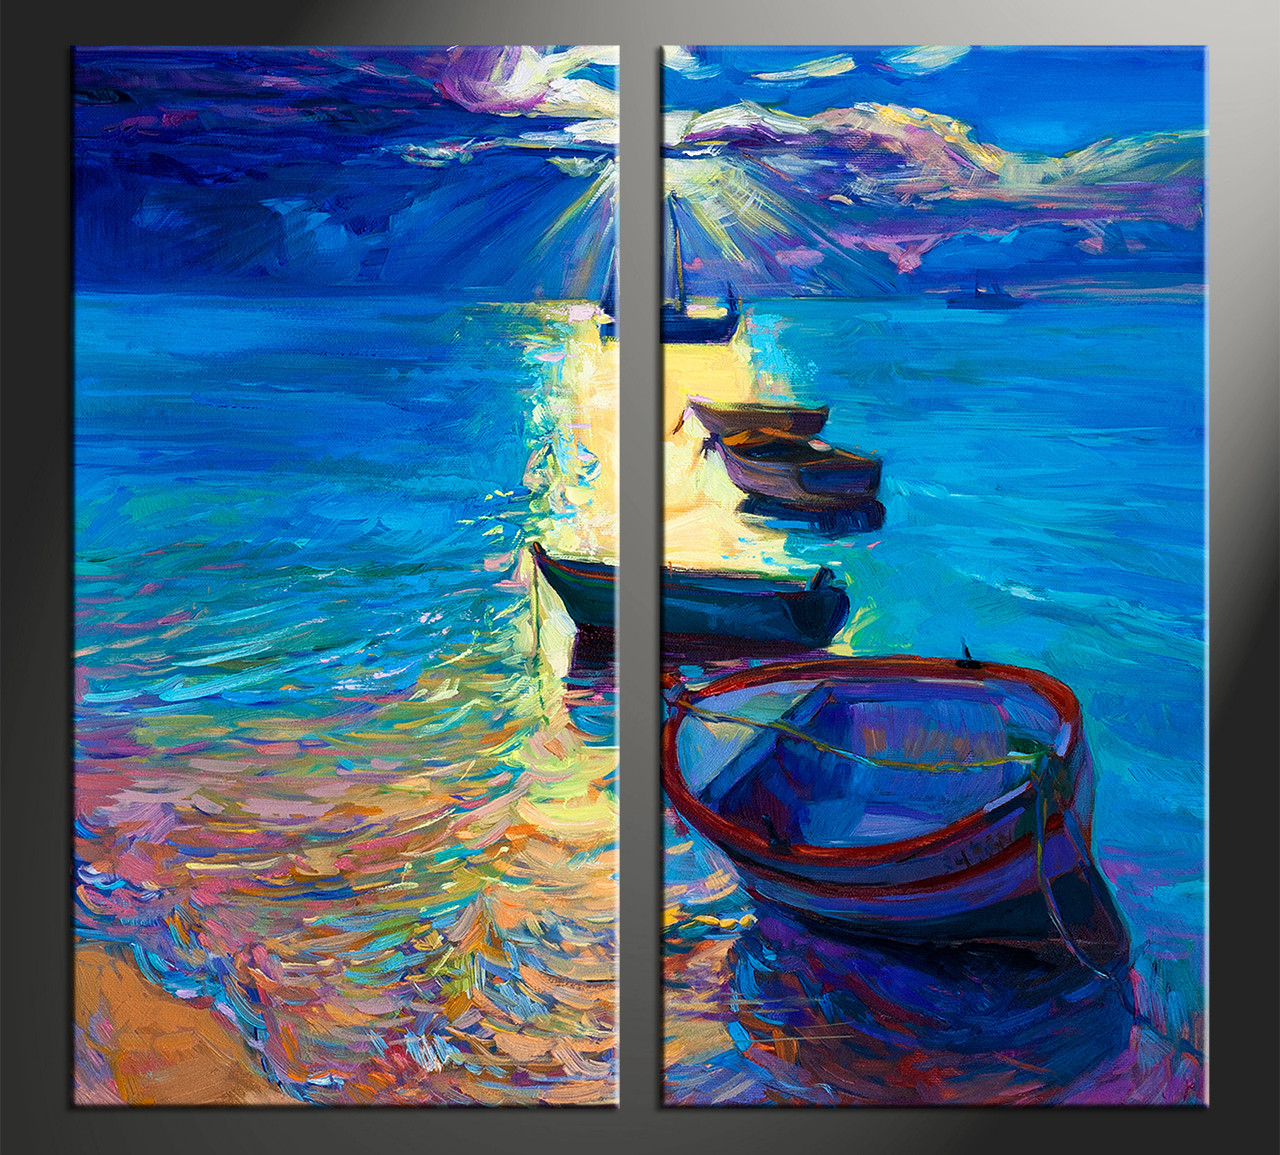 2 Piece Blue Ocean Oil Paintings Photo Canvas